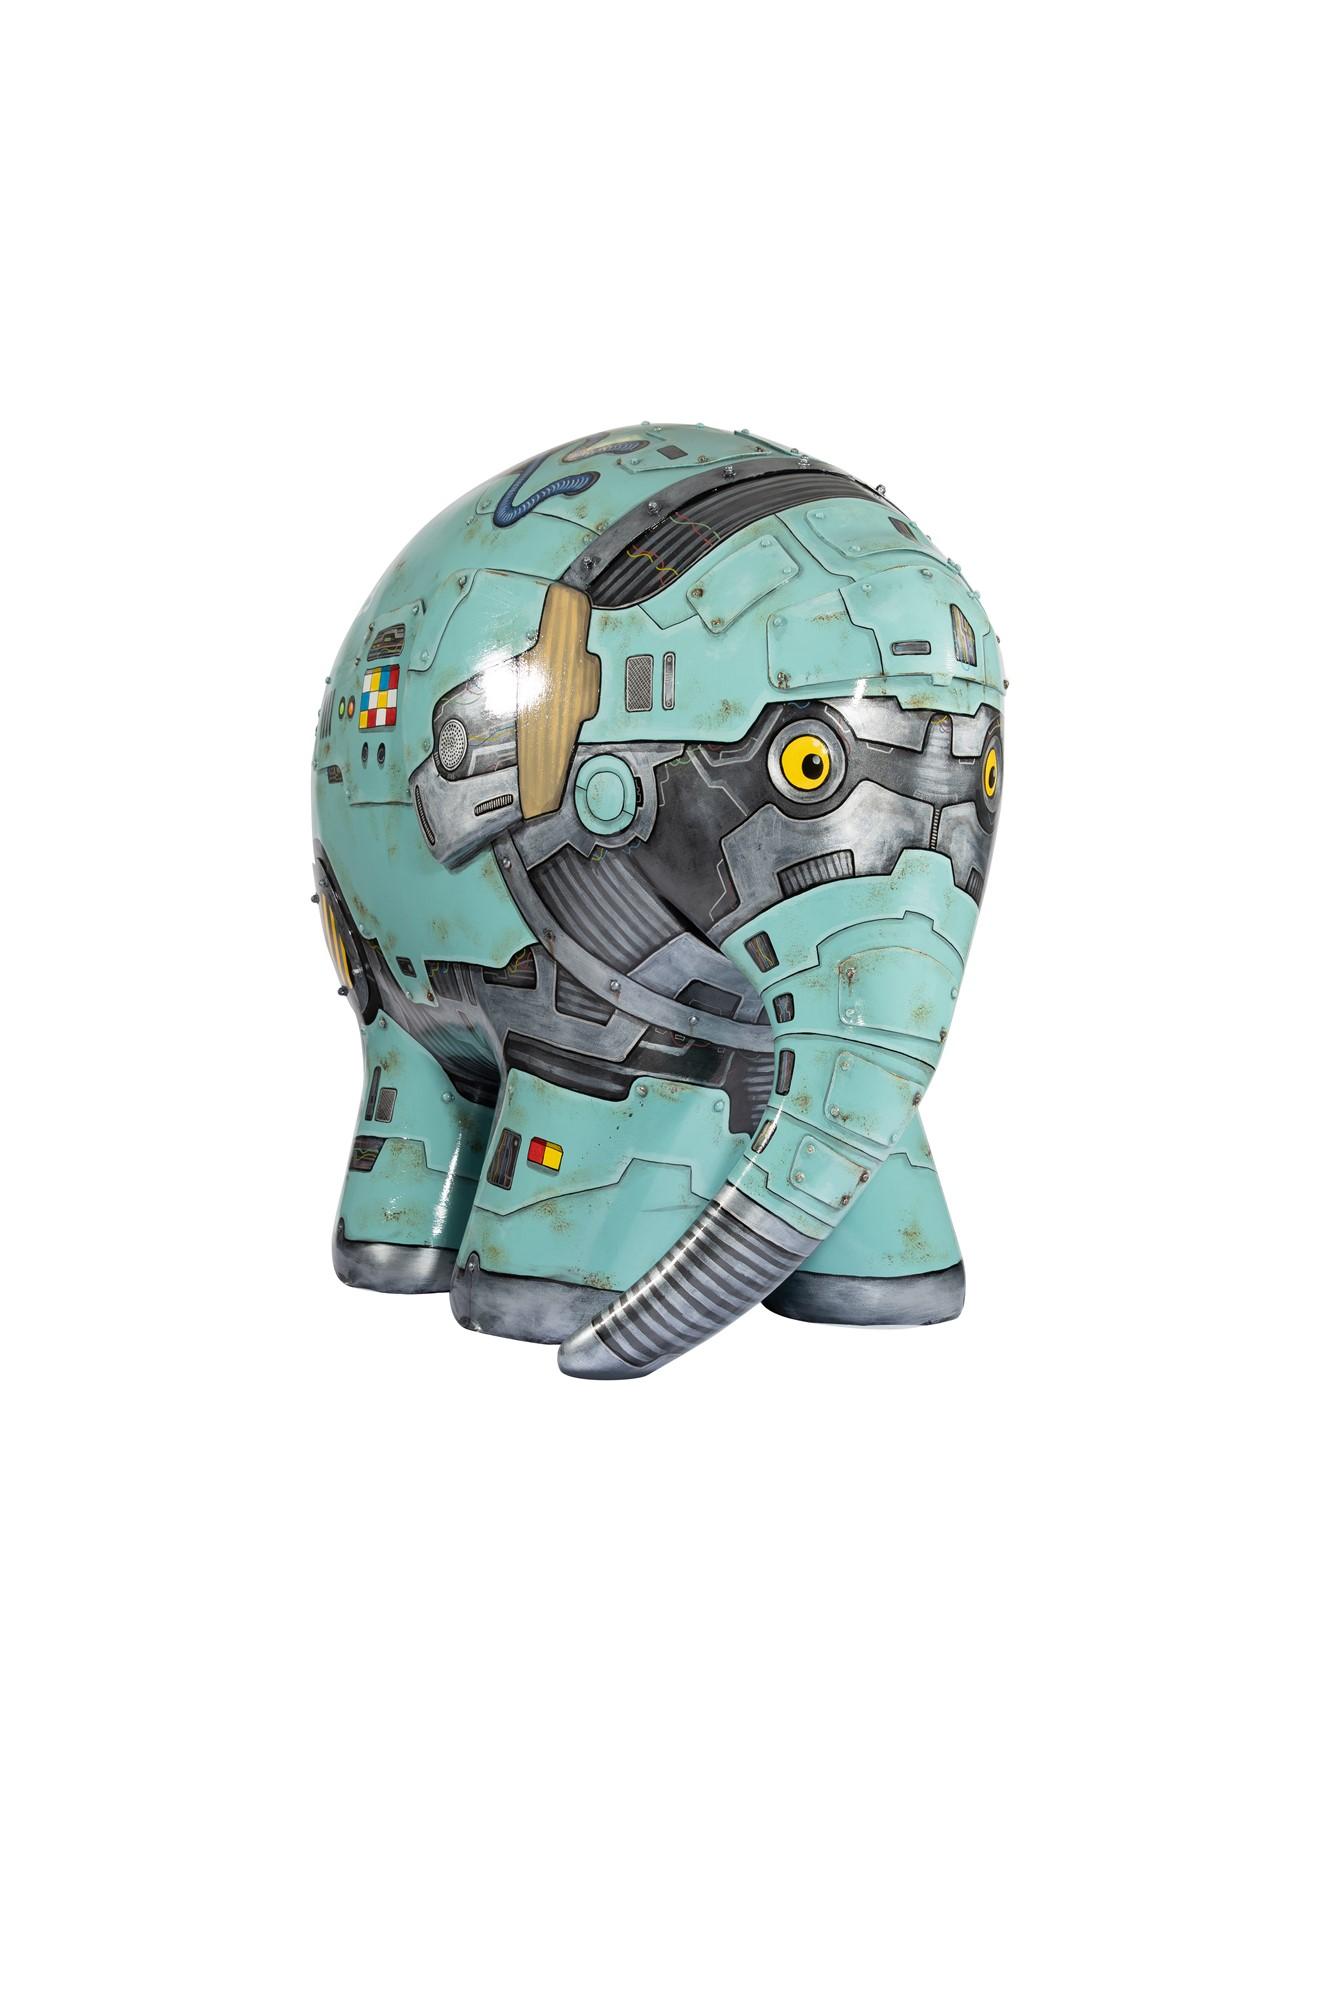 Lot 7 - Ele-bot